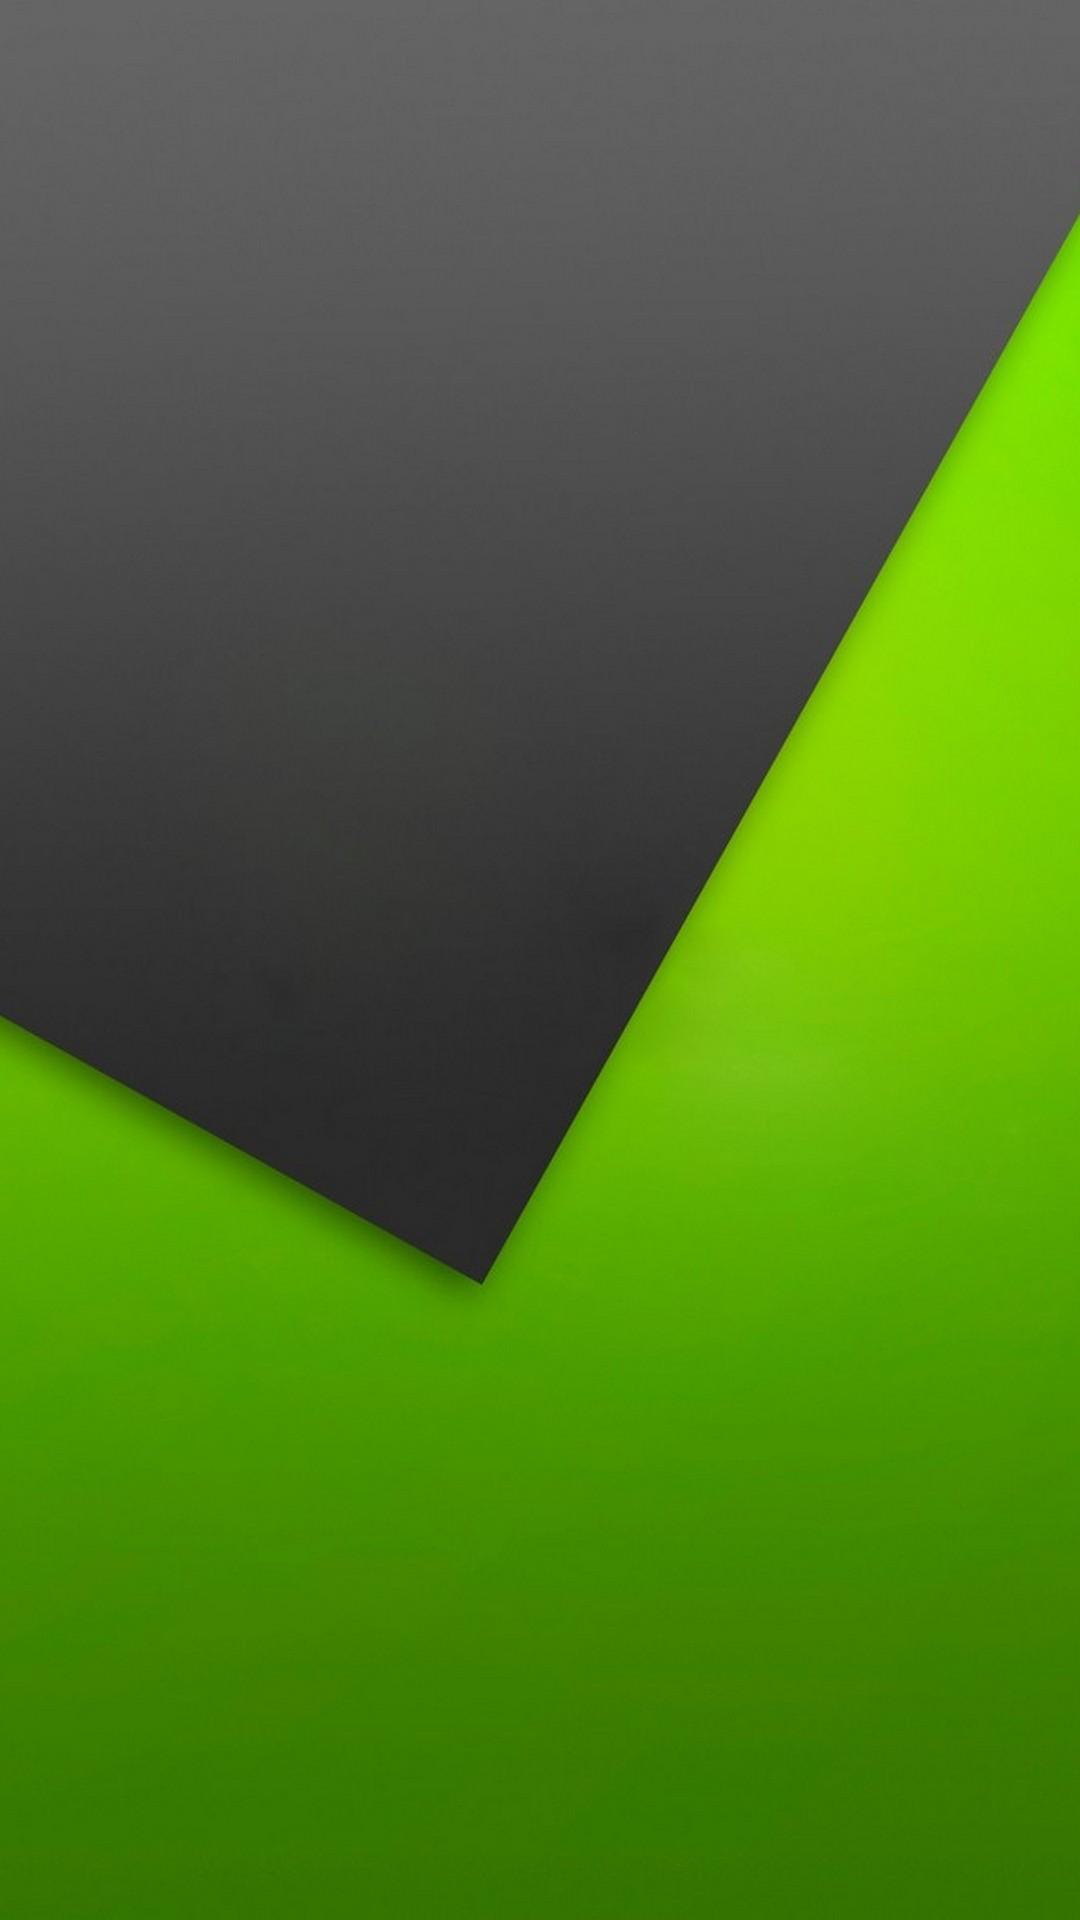 Green Iphone Wallpaper Hd 2020 Cute Wallpapers